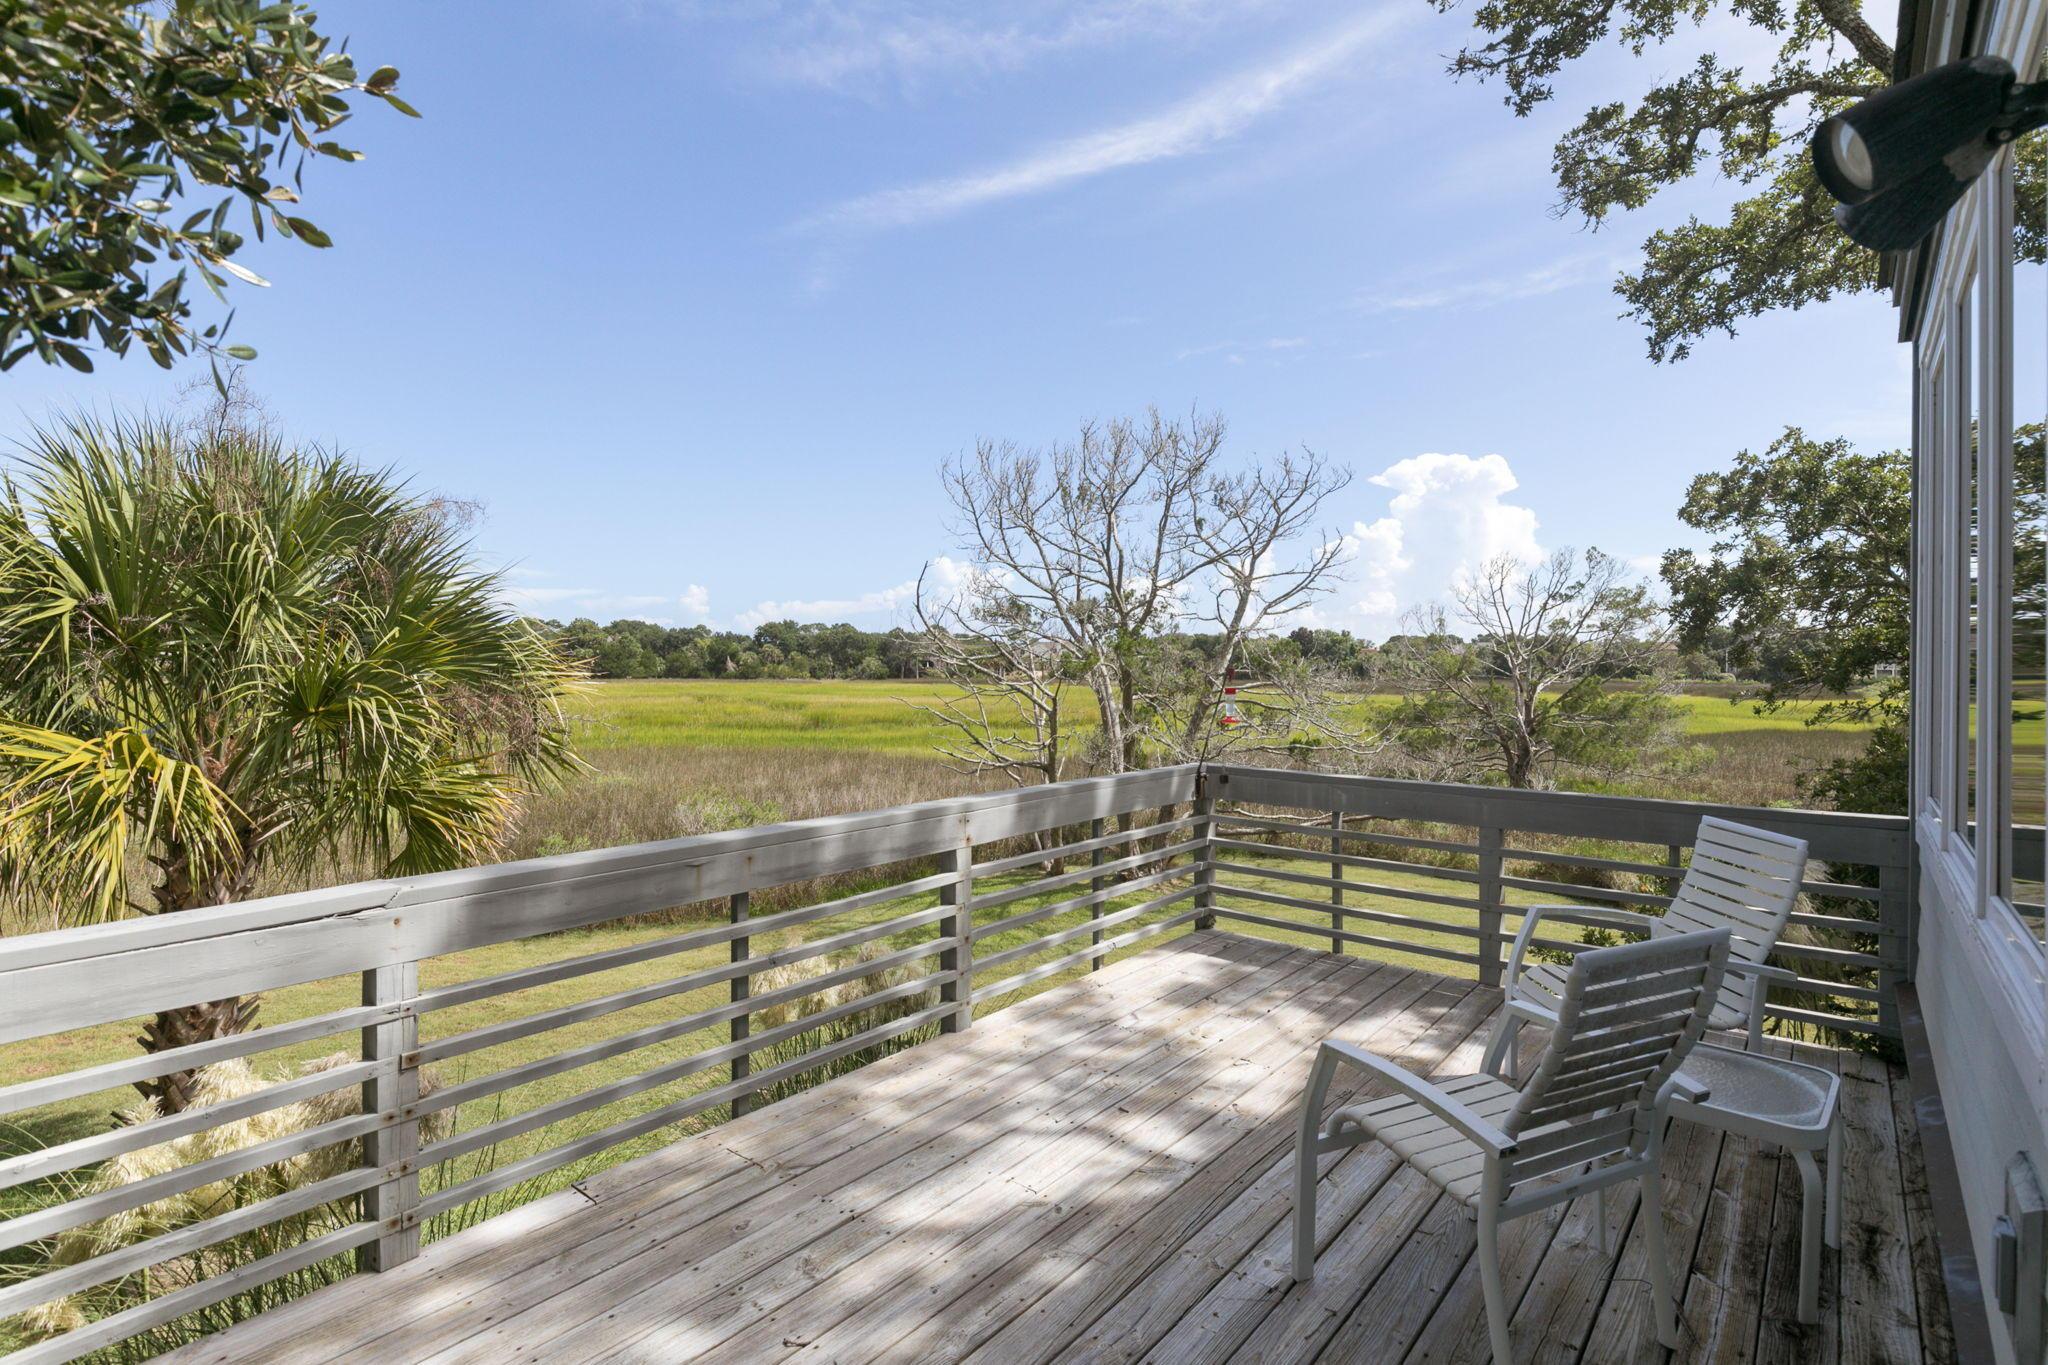 Seabrook Island Homes For Sale - 3360 Seabrook Island, Seabrook Island, SC - 7